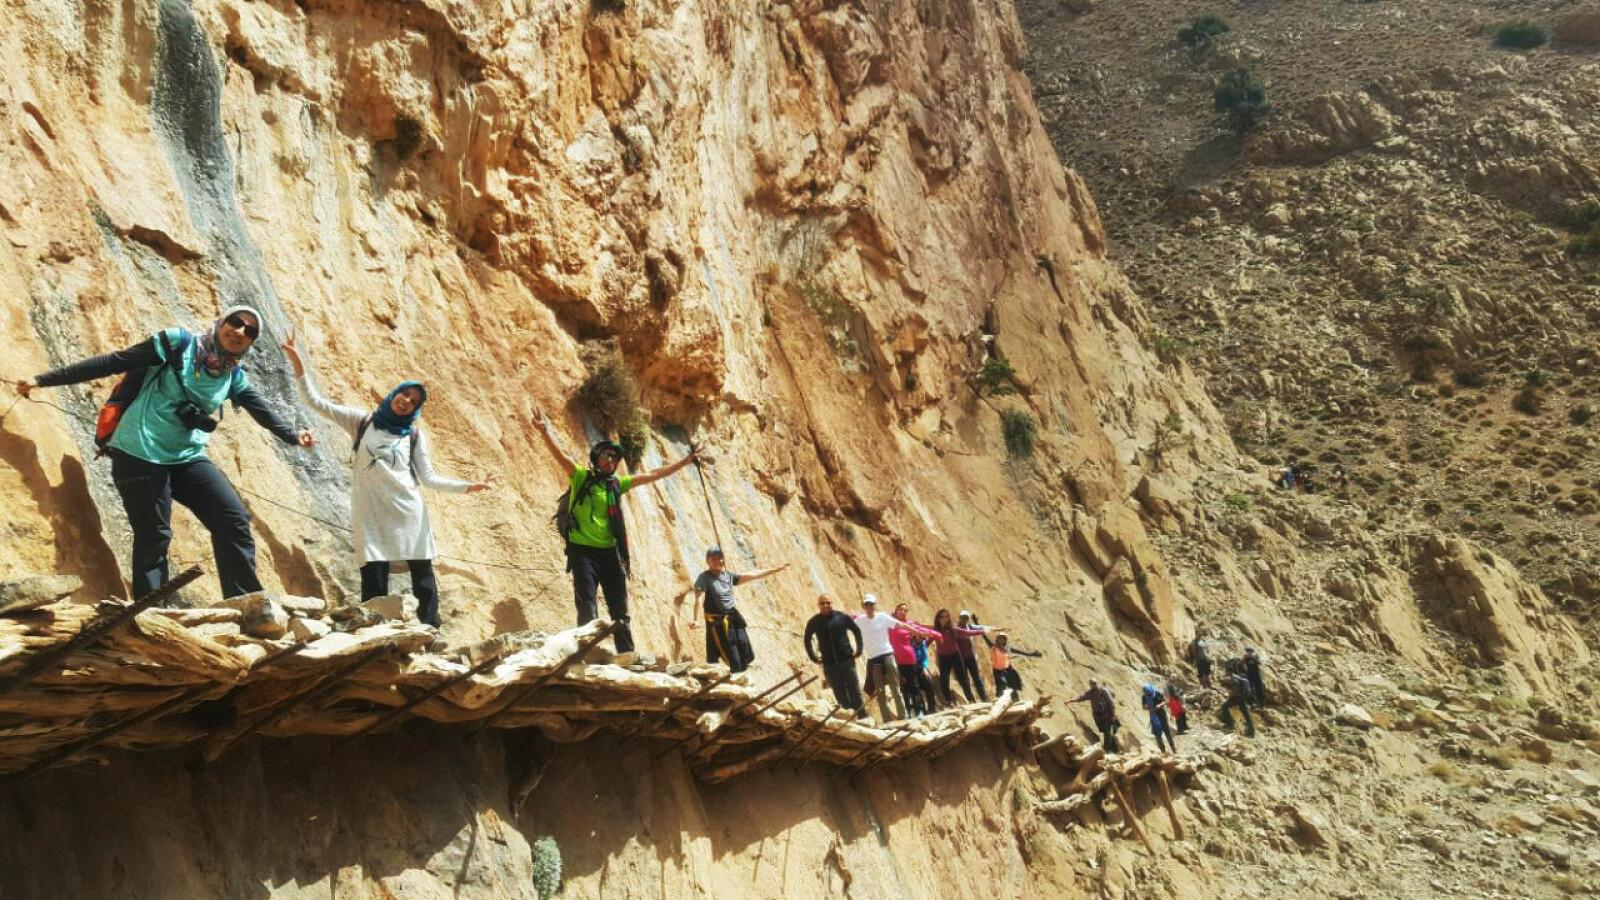 <b>BERBERBROEN:</b>Passage des ponts berberes er en enkel, men luftig passasje i Taghia <br/>i Marokko.